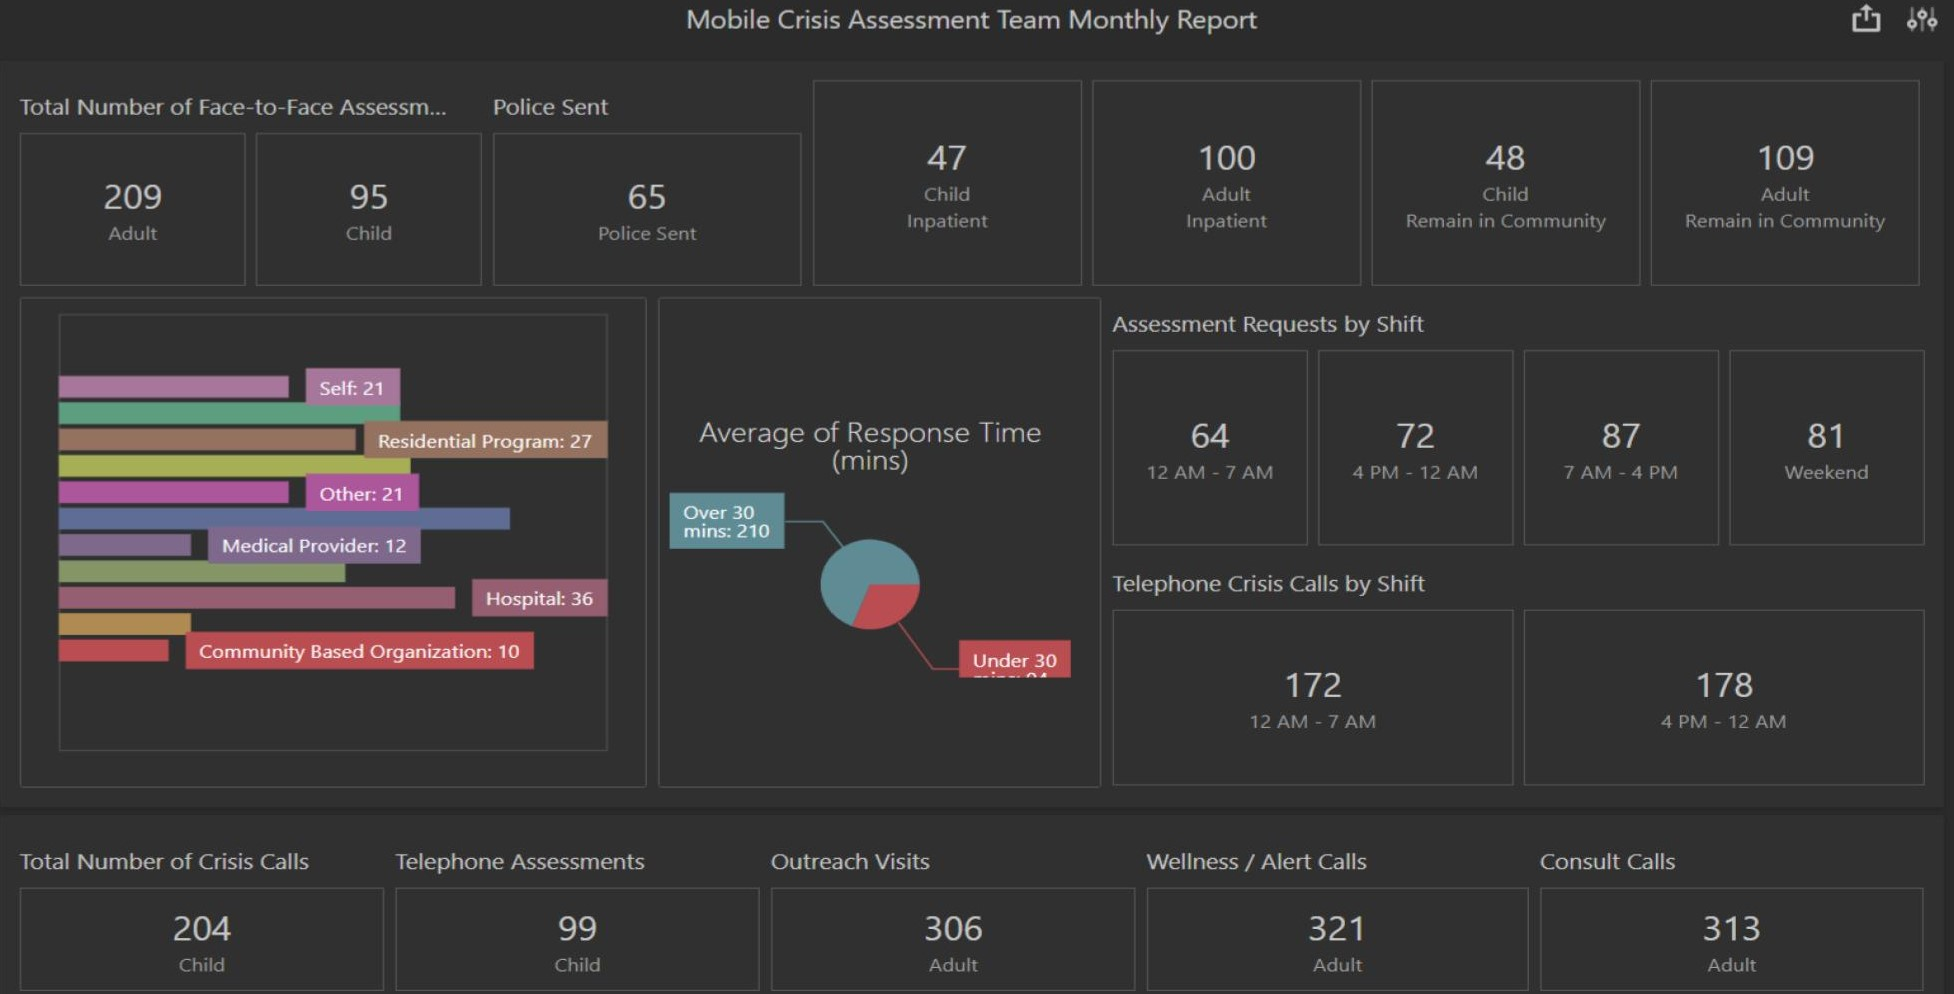 Mobile Crisis Dashboard